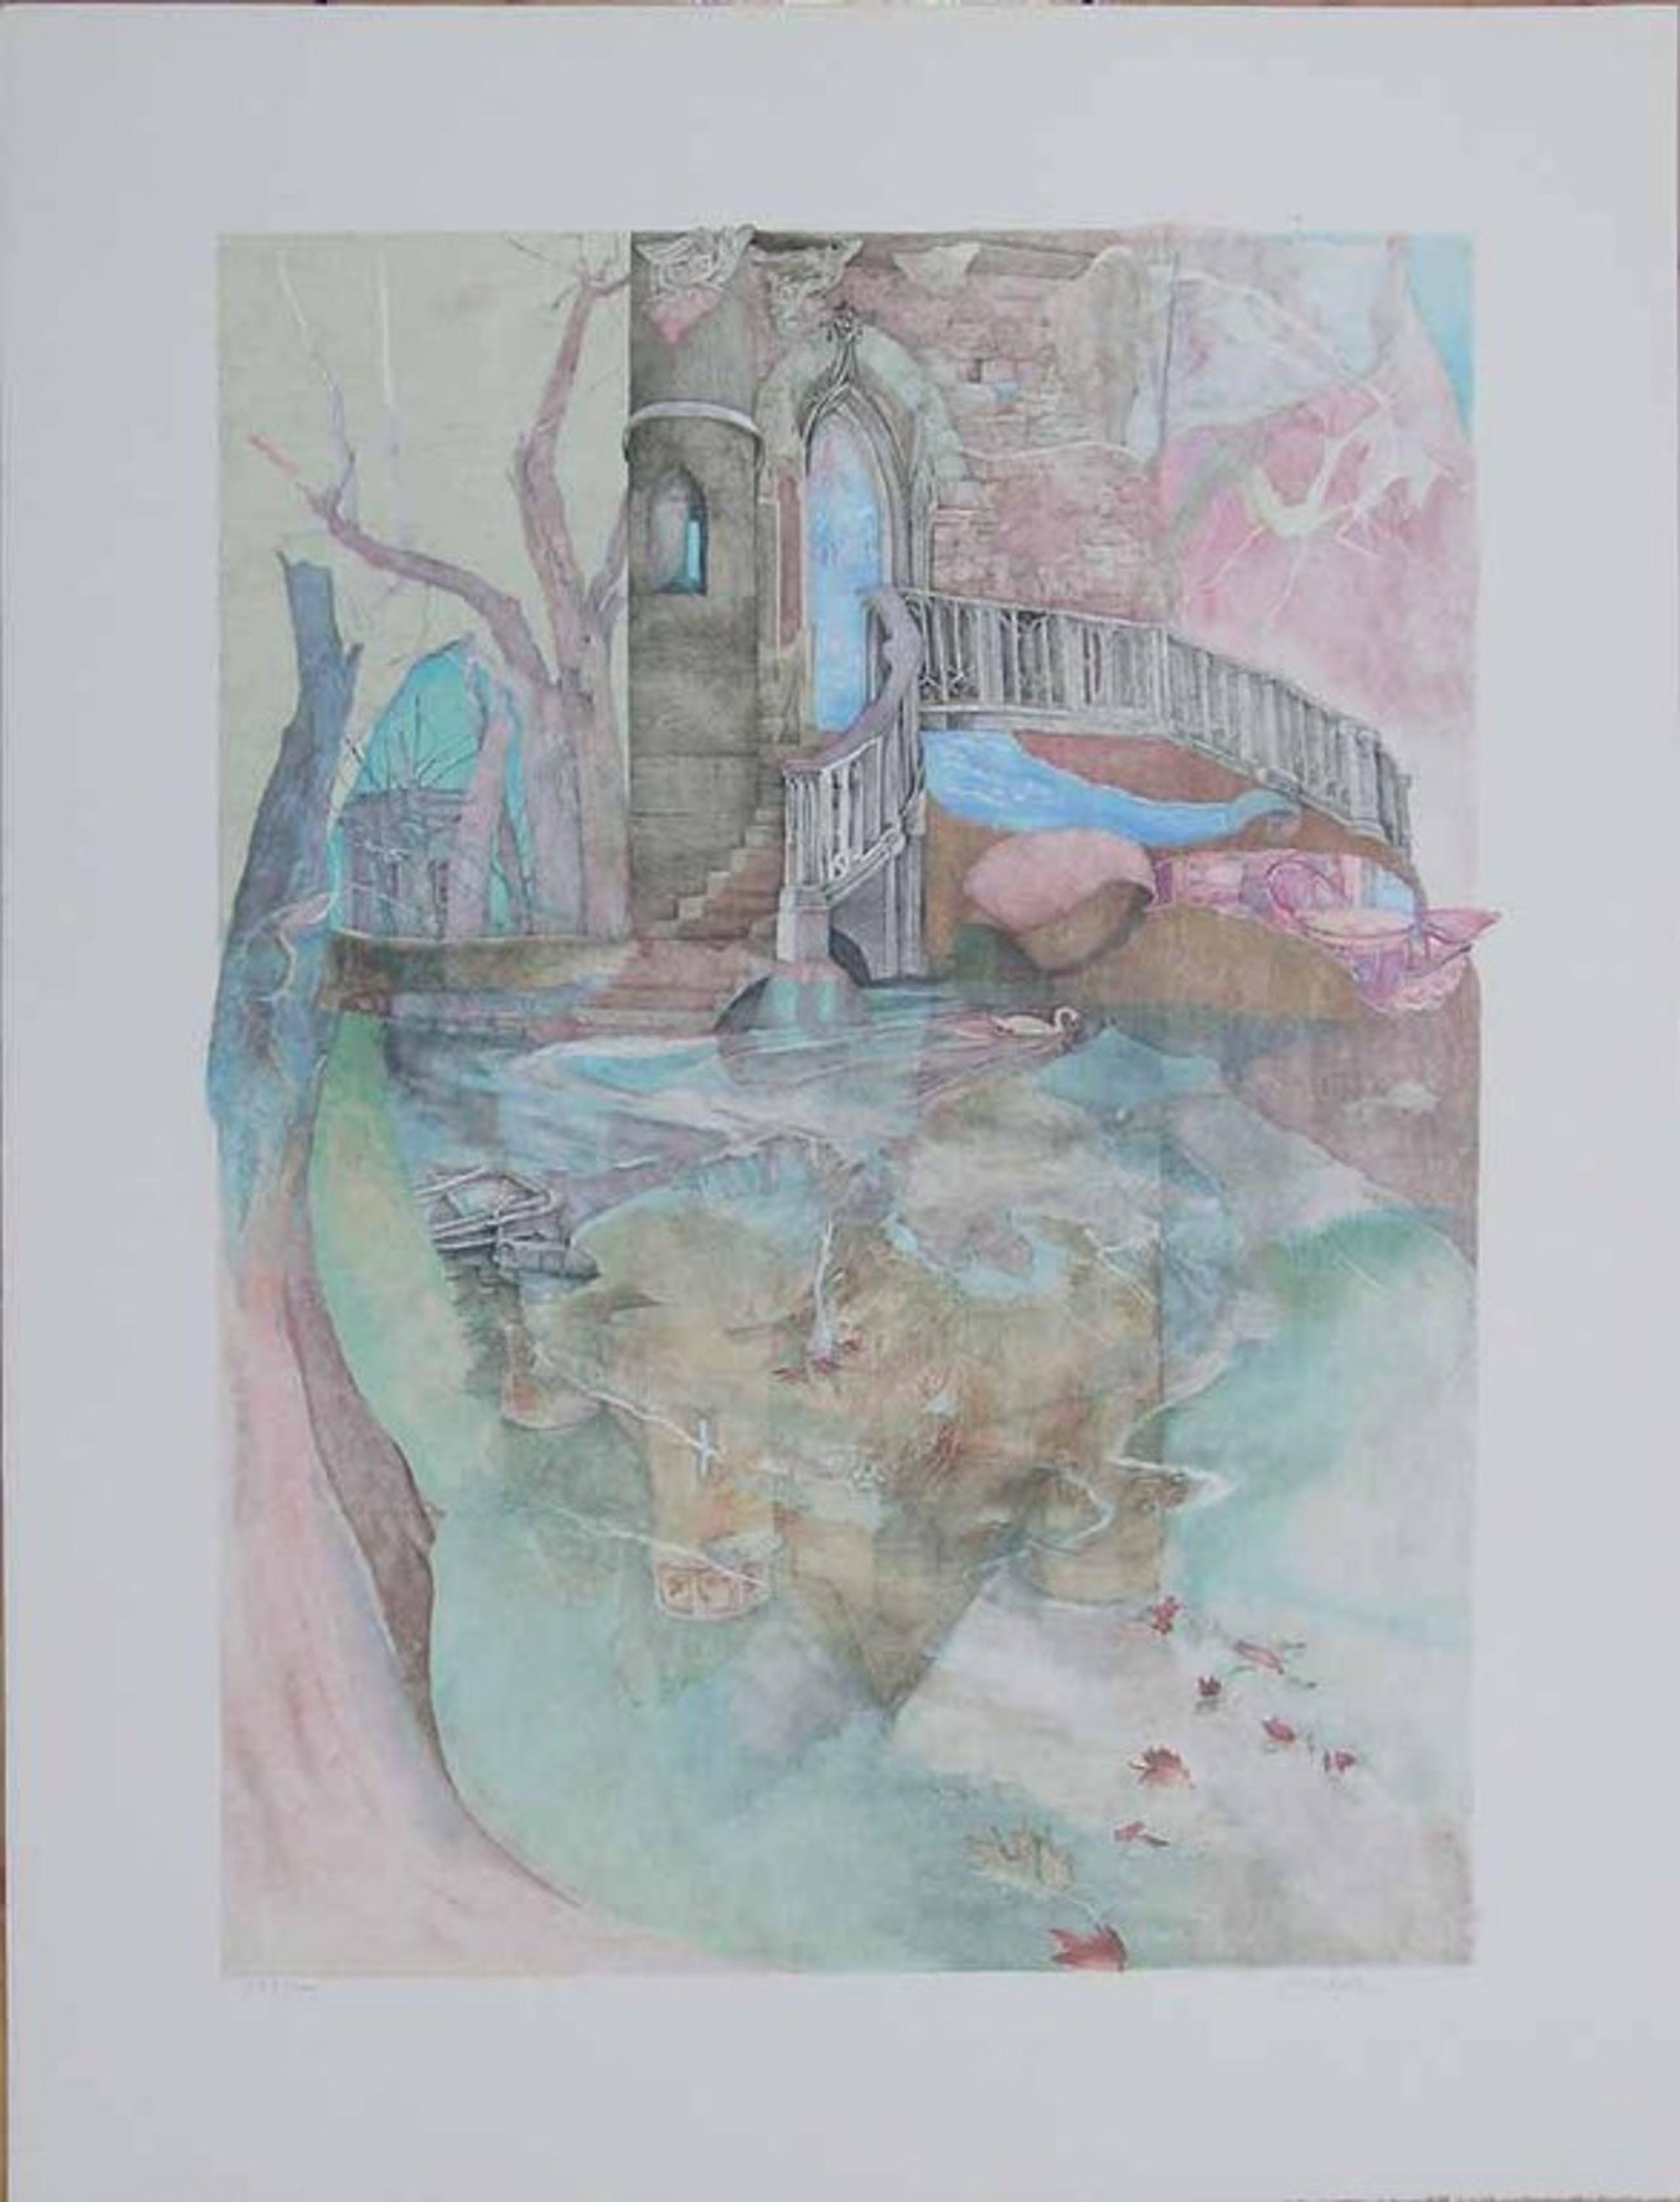 Anton Krajnc: Lithografie, Transylvania kopen? Bied vanaf 19!